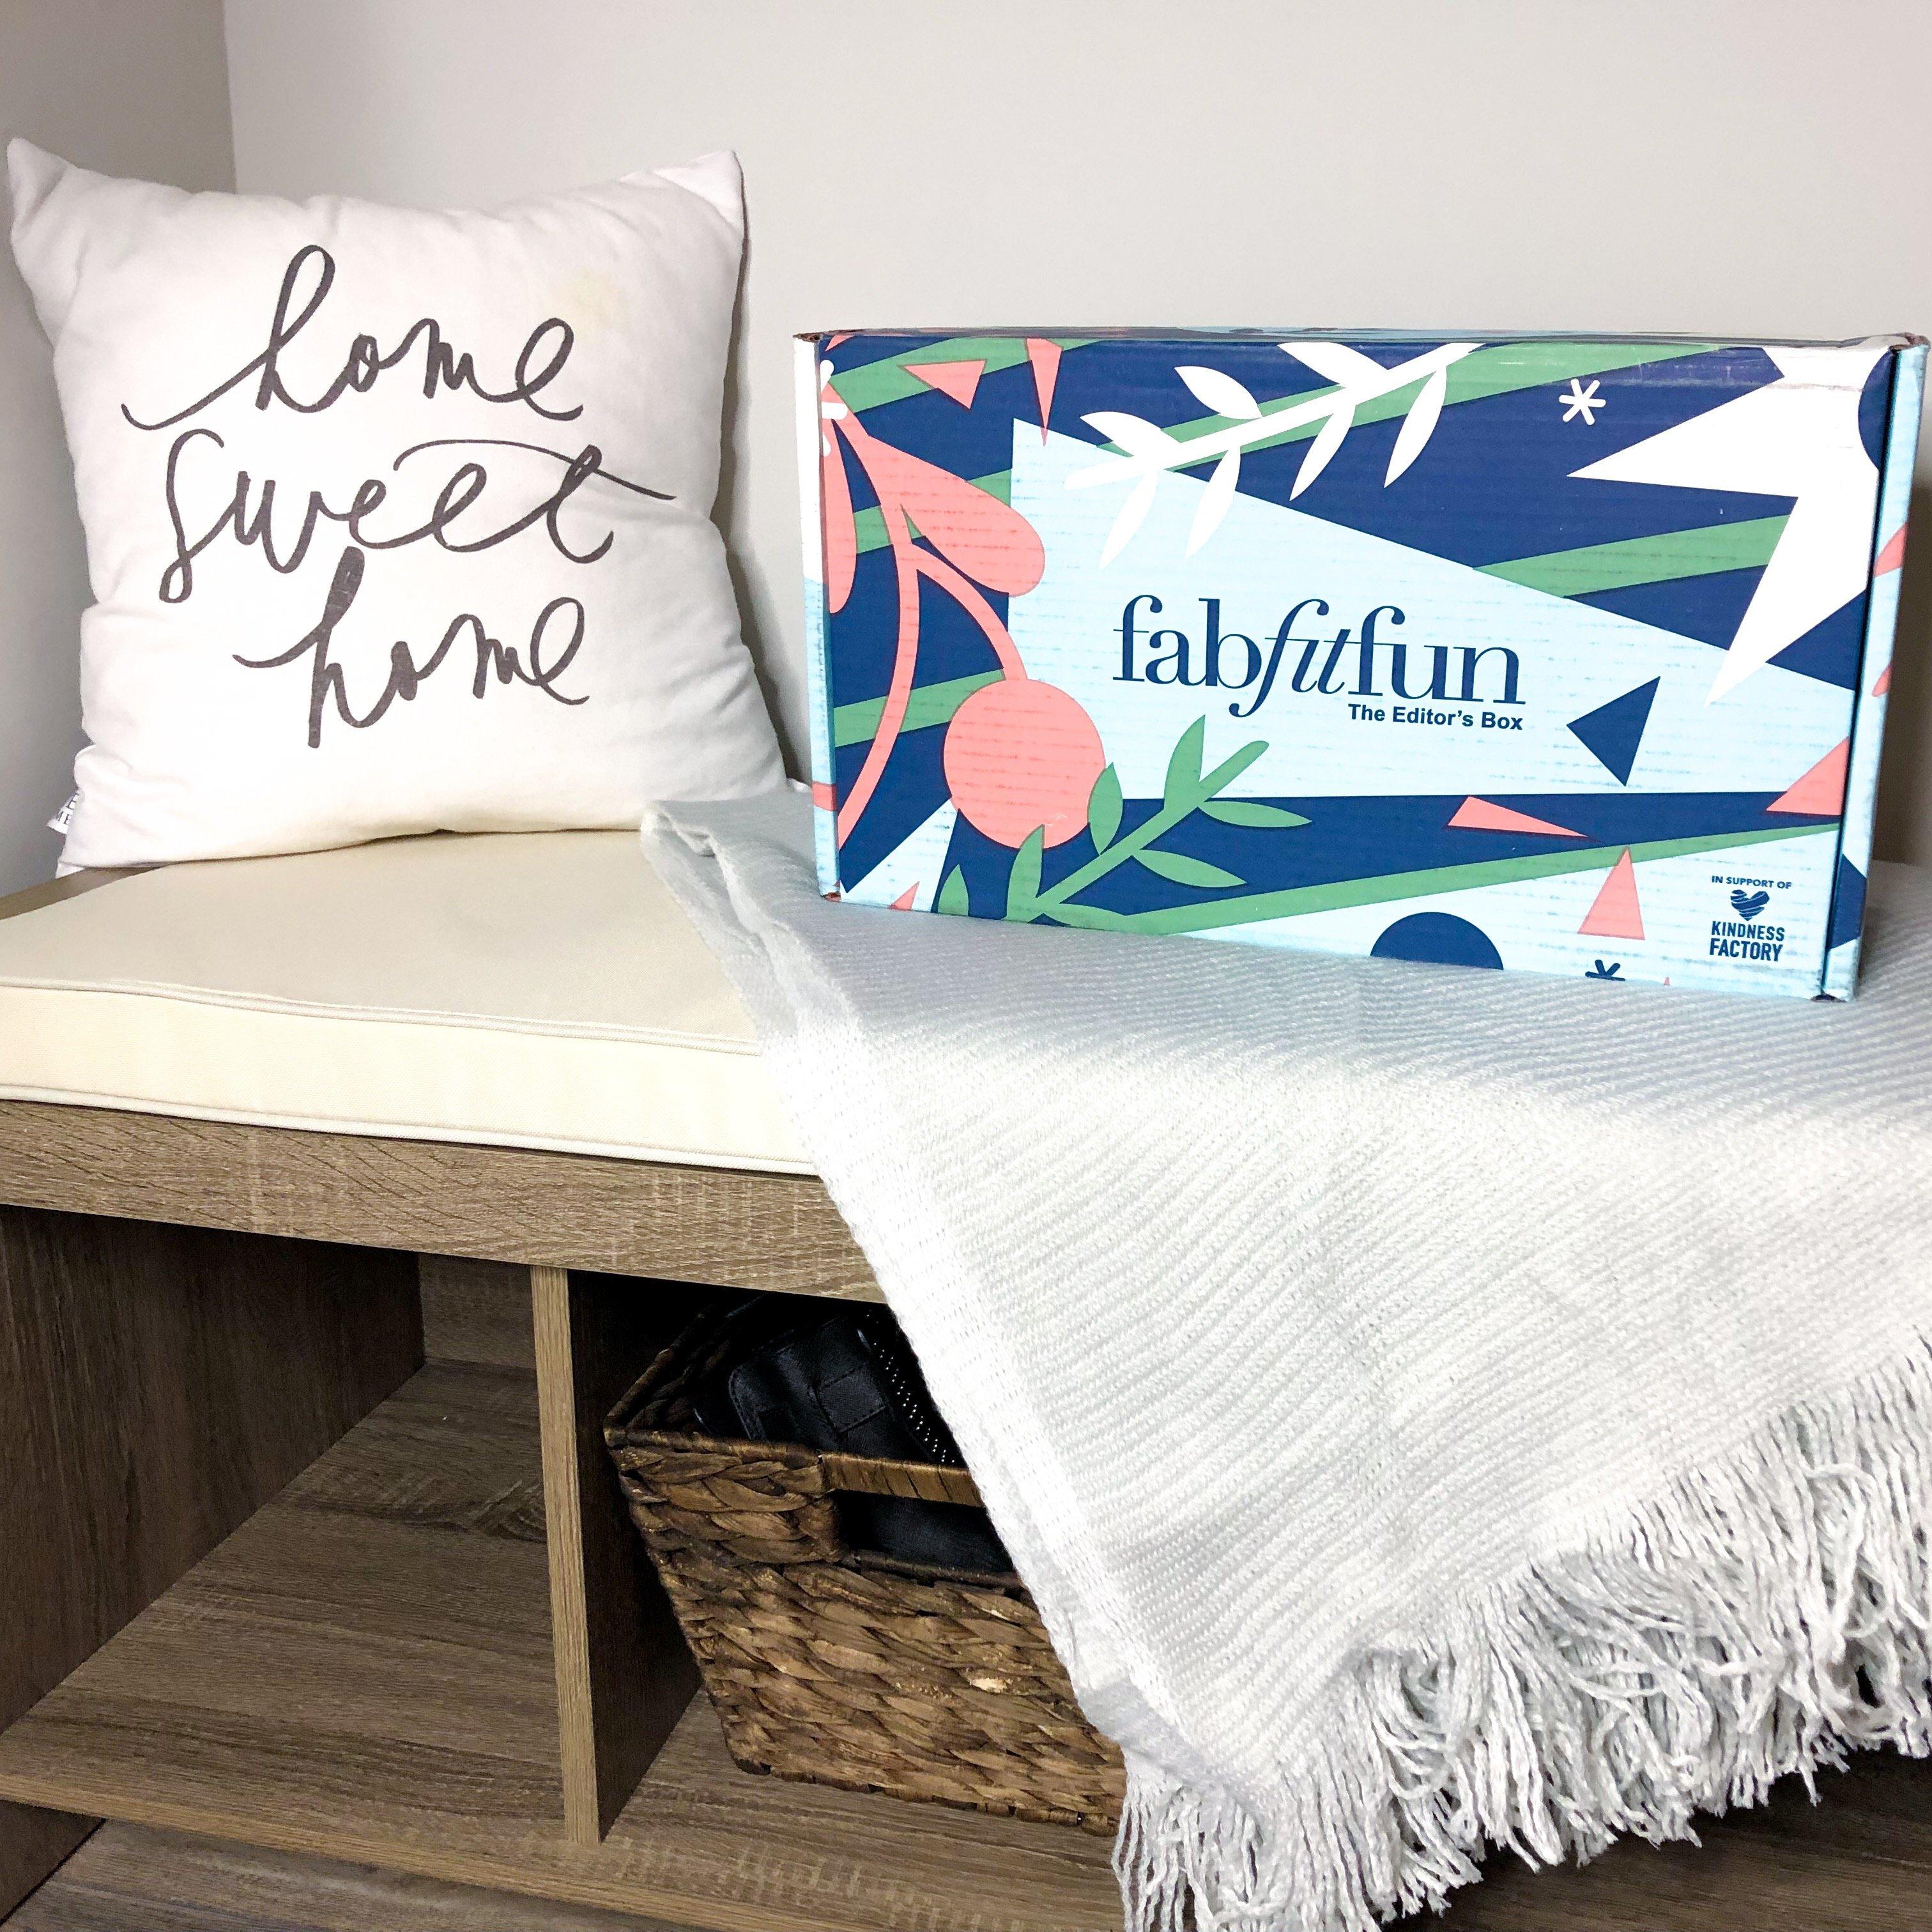 Unboxing: FabFitFun Winter Editor's 2018 Box